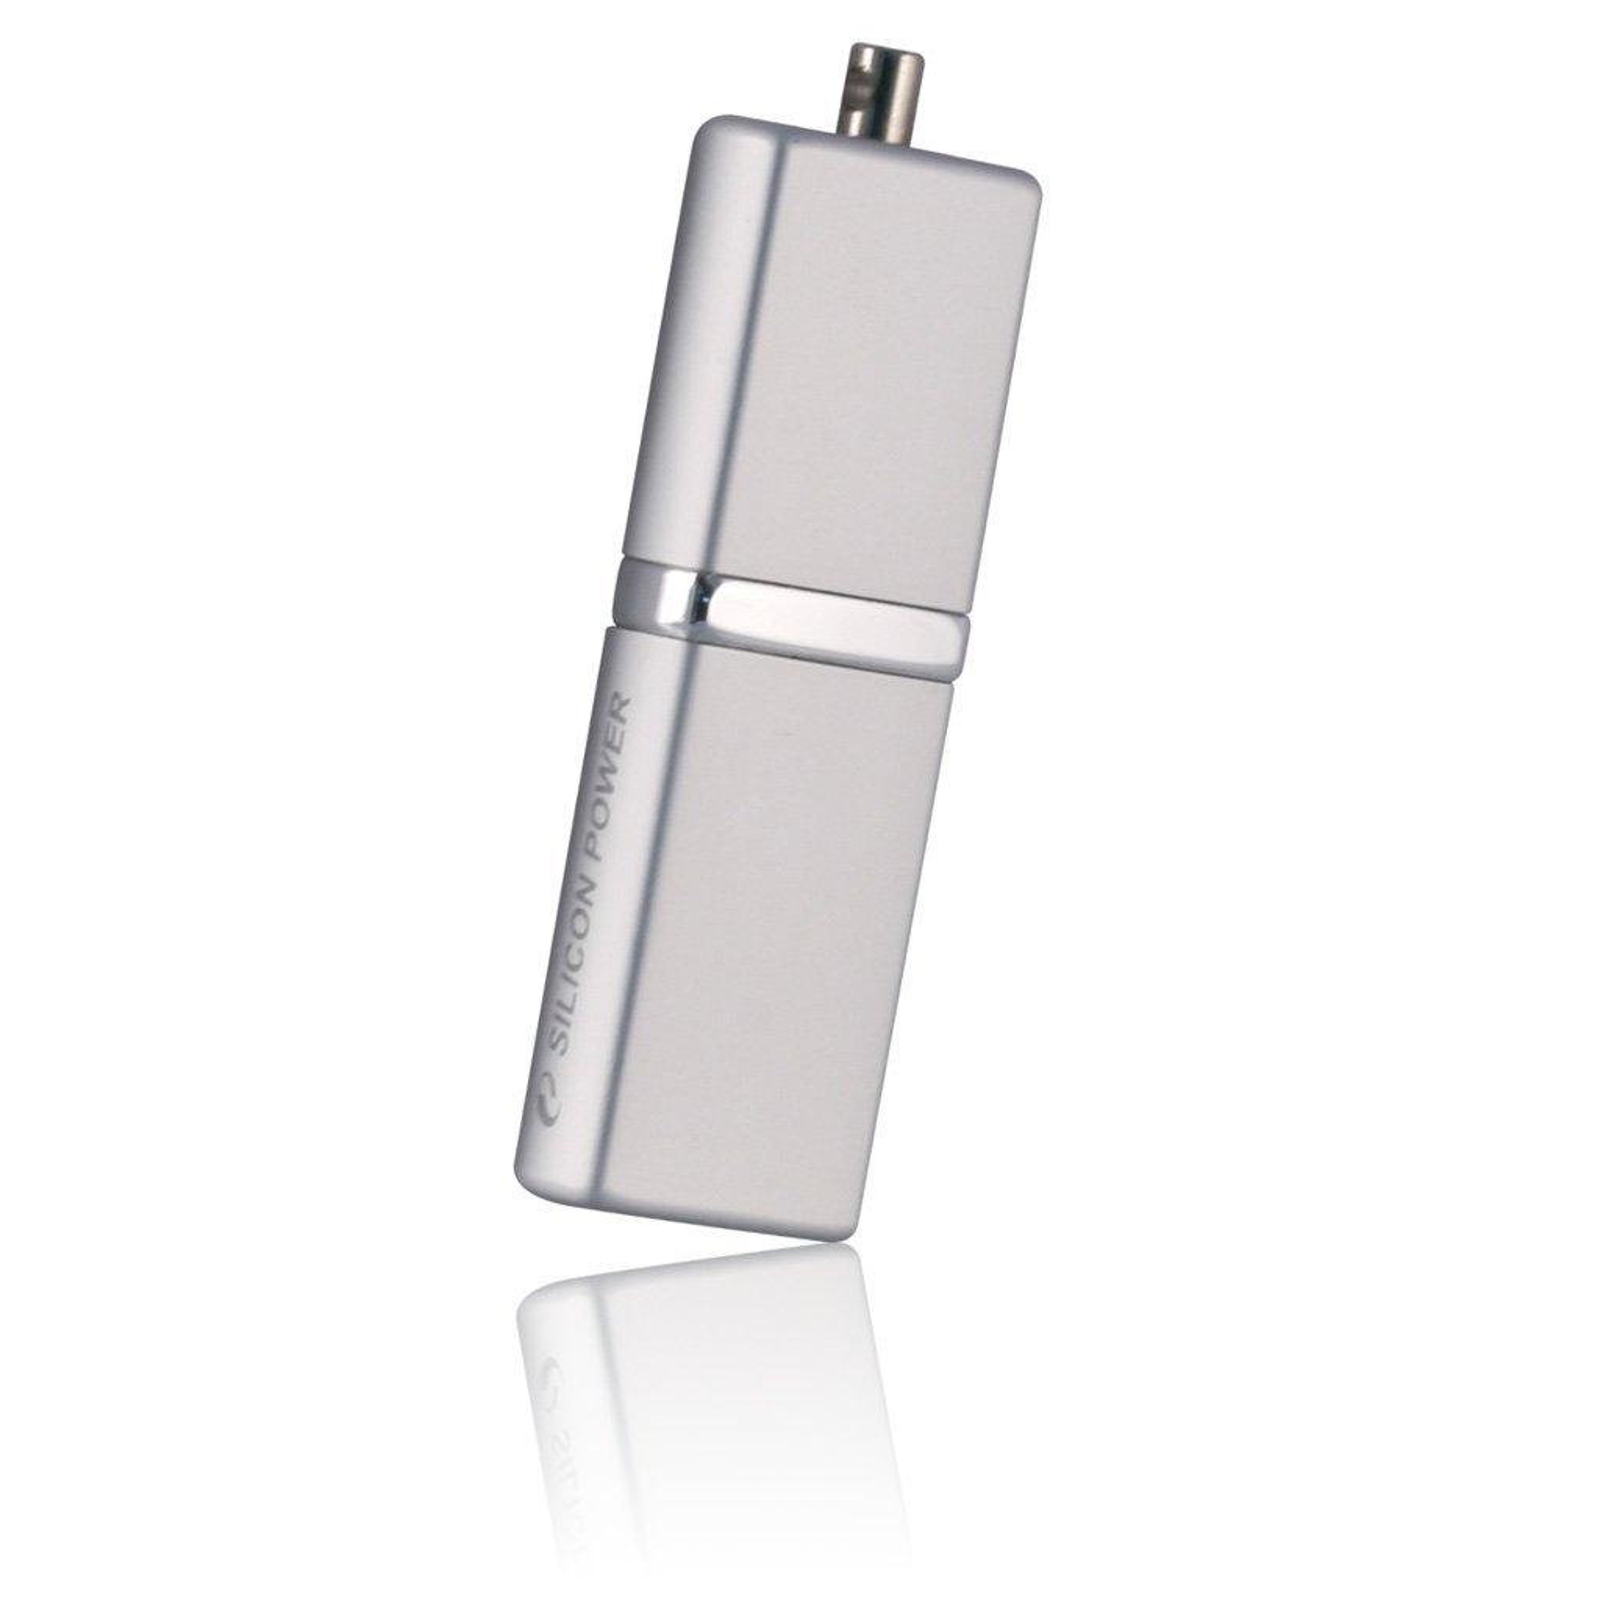 USB флеш накопитель Silicon Power 16Gb LuxMini 710 silver (SP016GBUF2710V1S) изображение 2